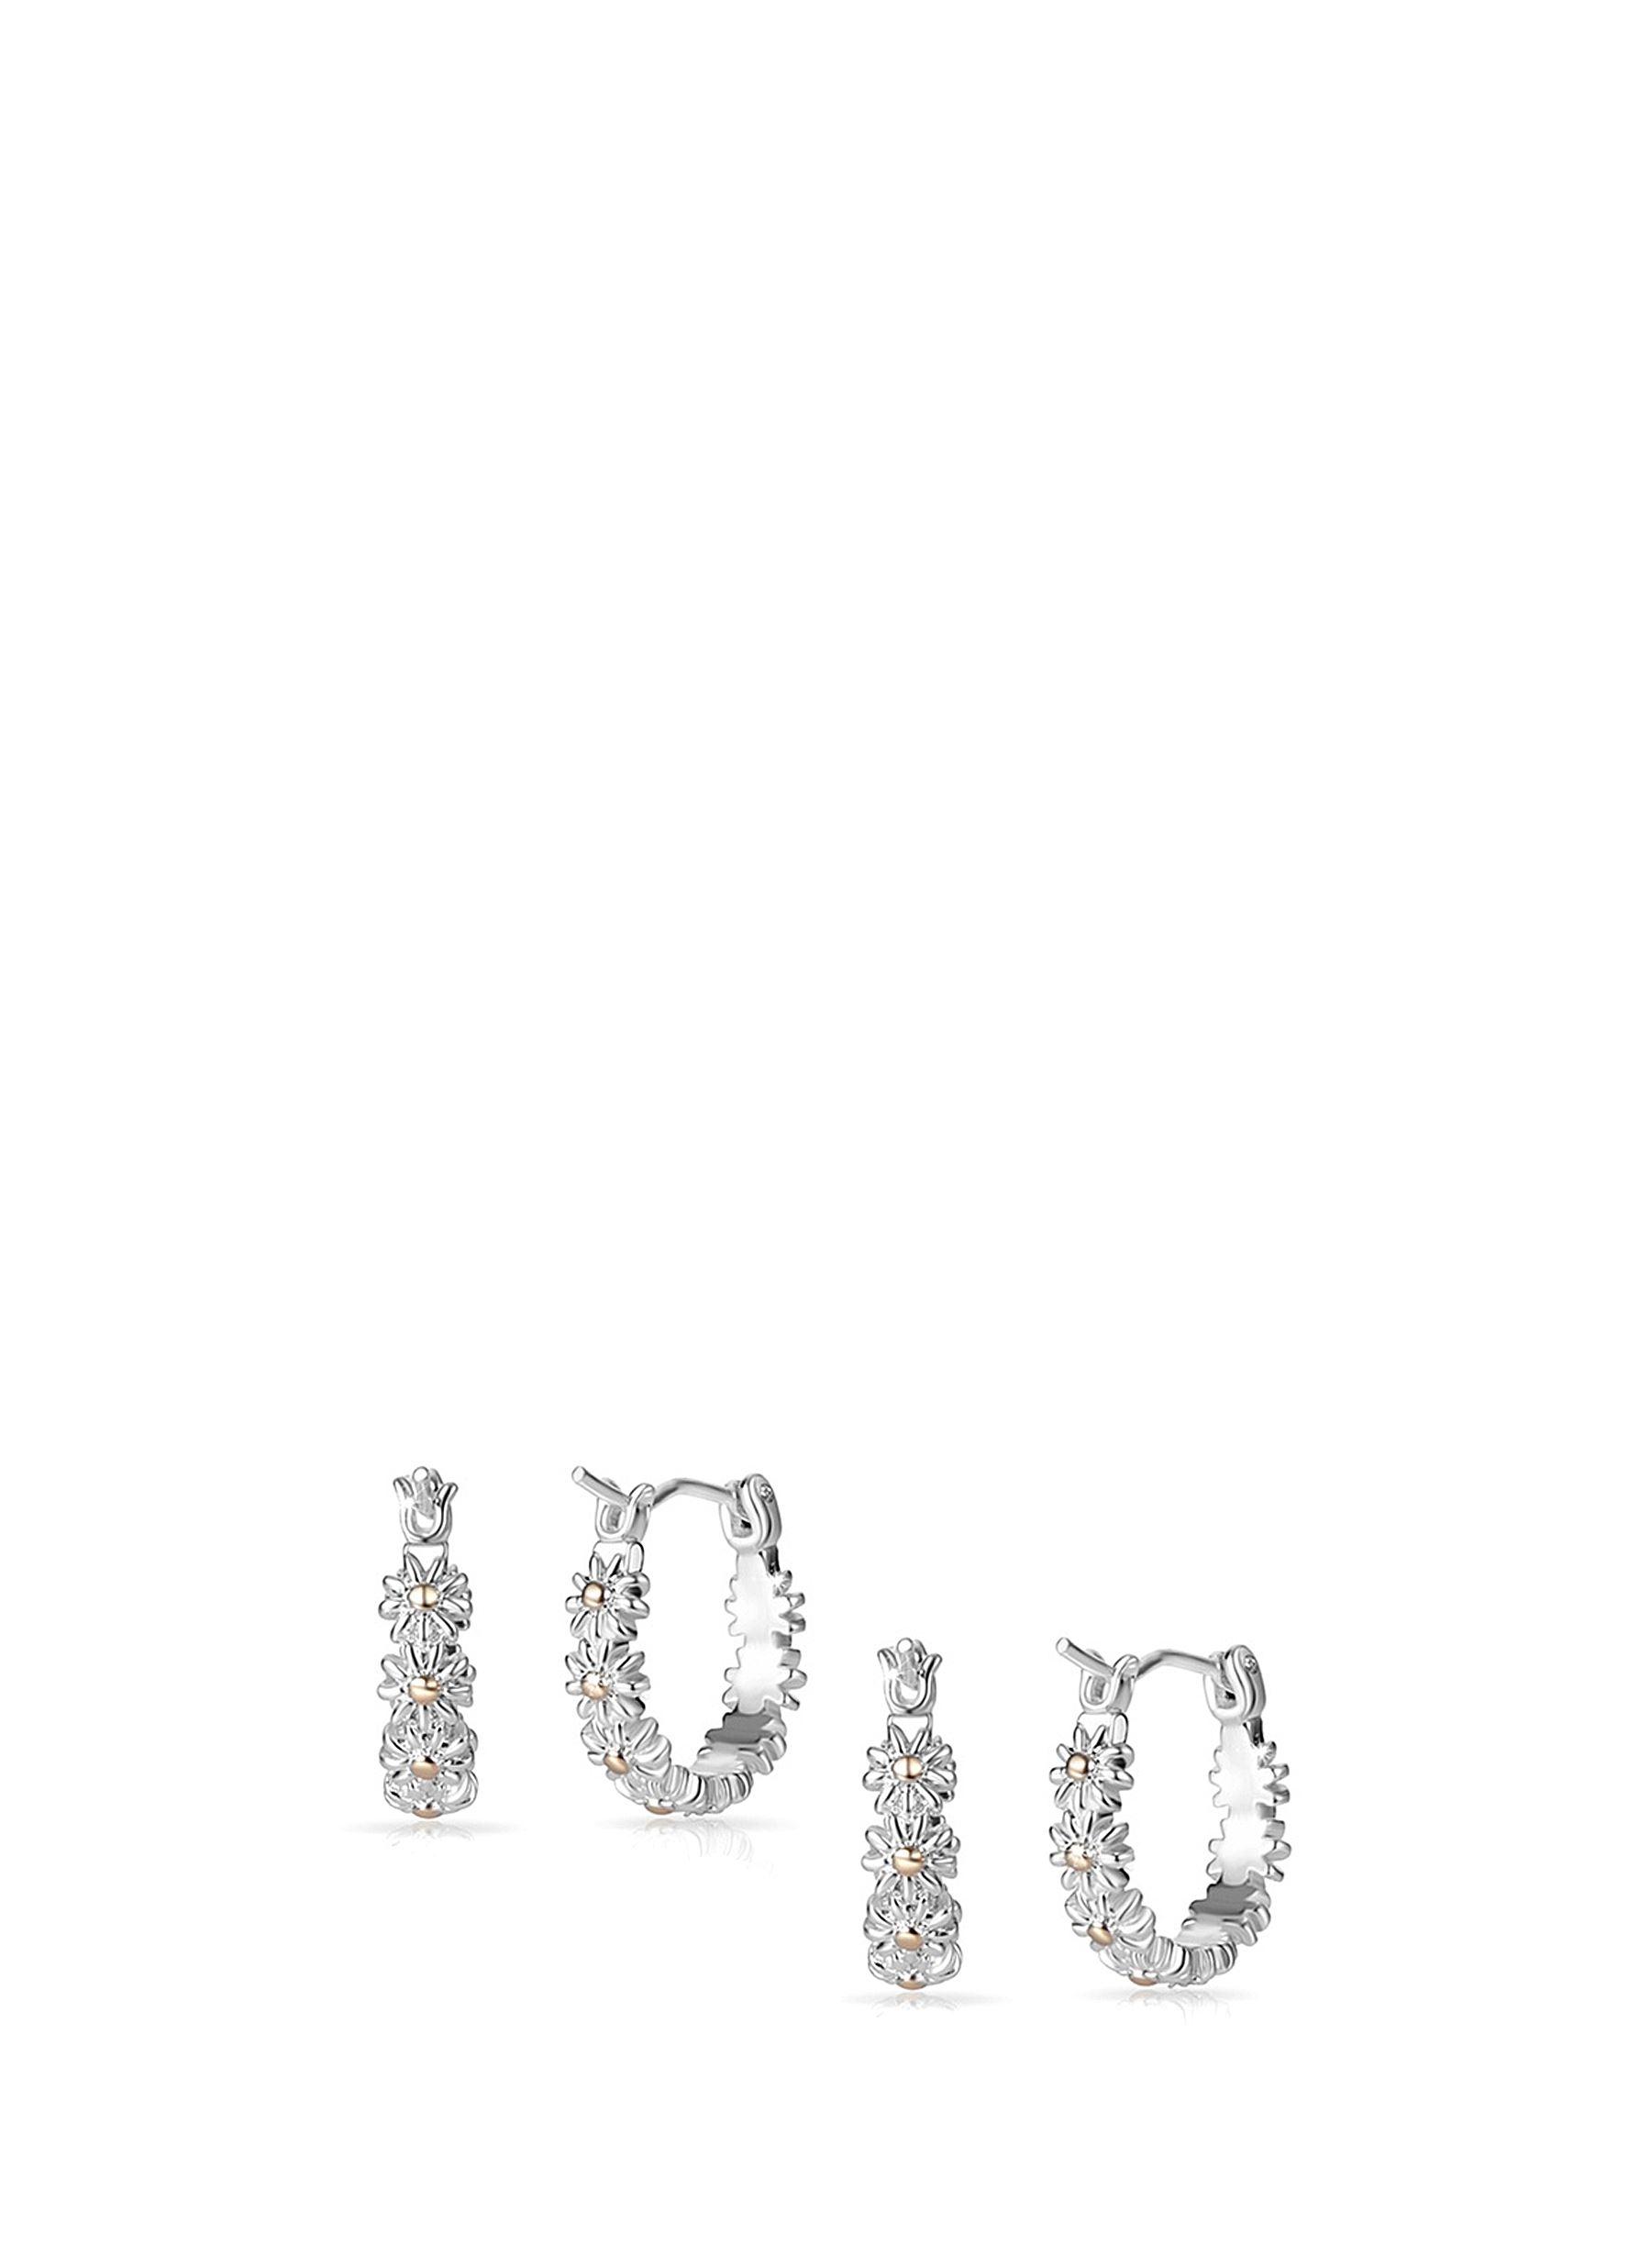 Detailed Look - Γυναικεία Σκουλαρίκια Philip Jones